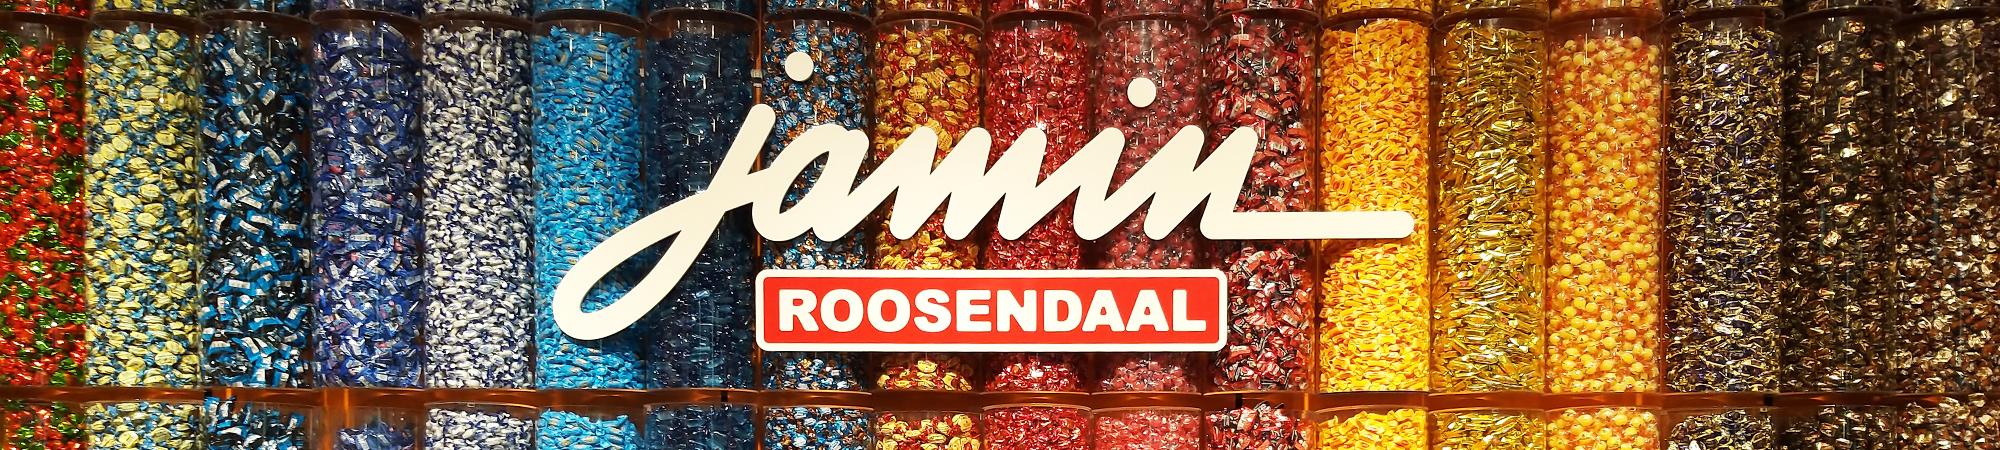 Freesletters - Jamin Roosendaal